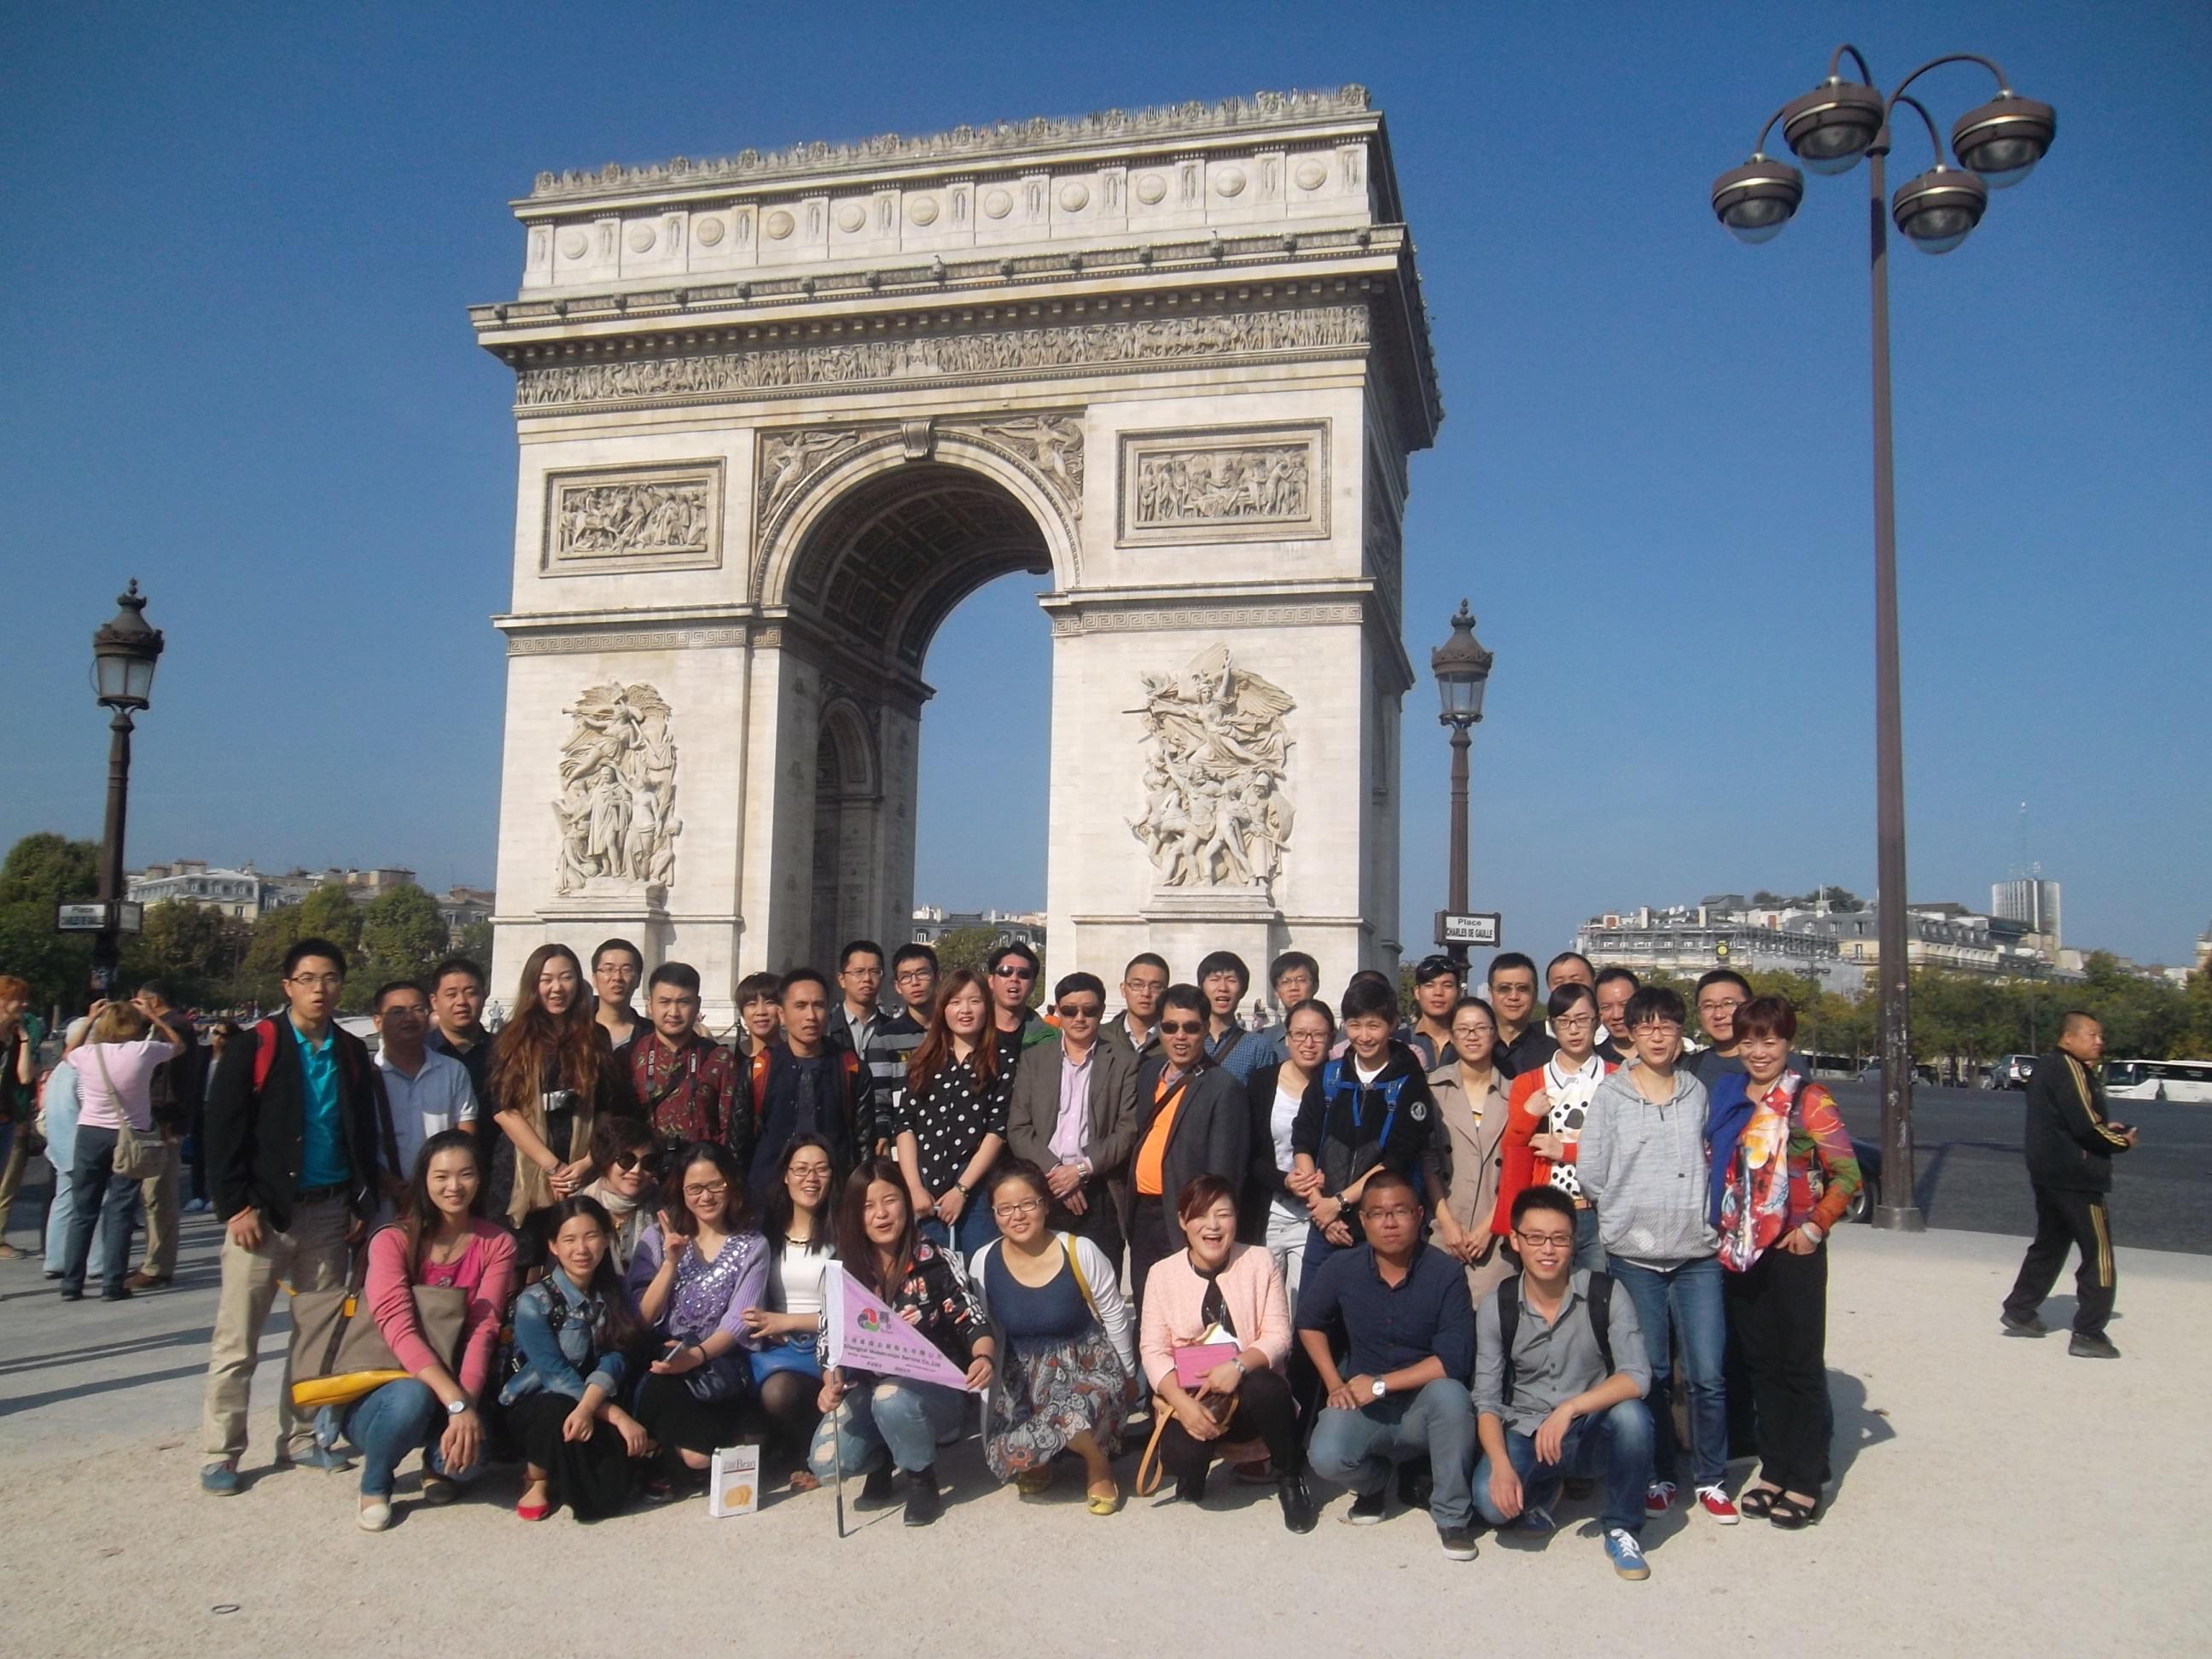 Texworld-法国国际面料展